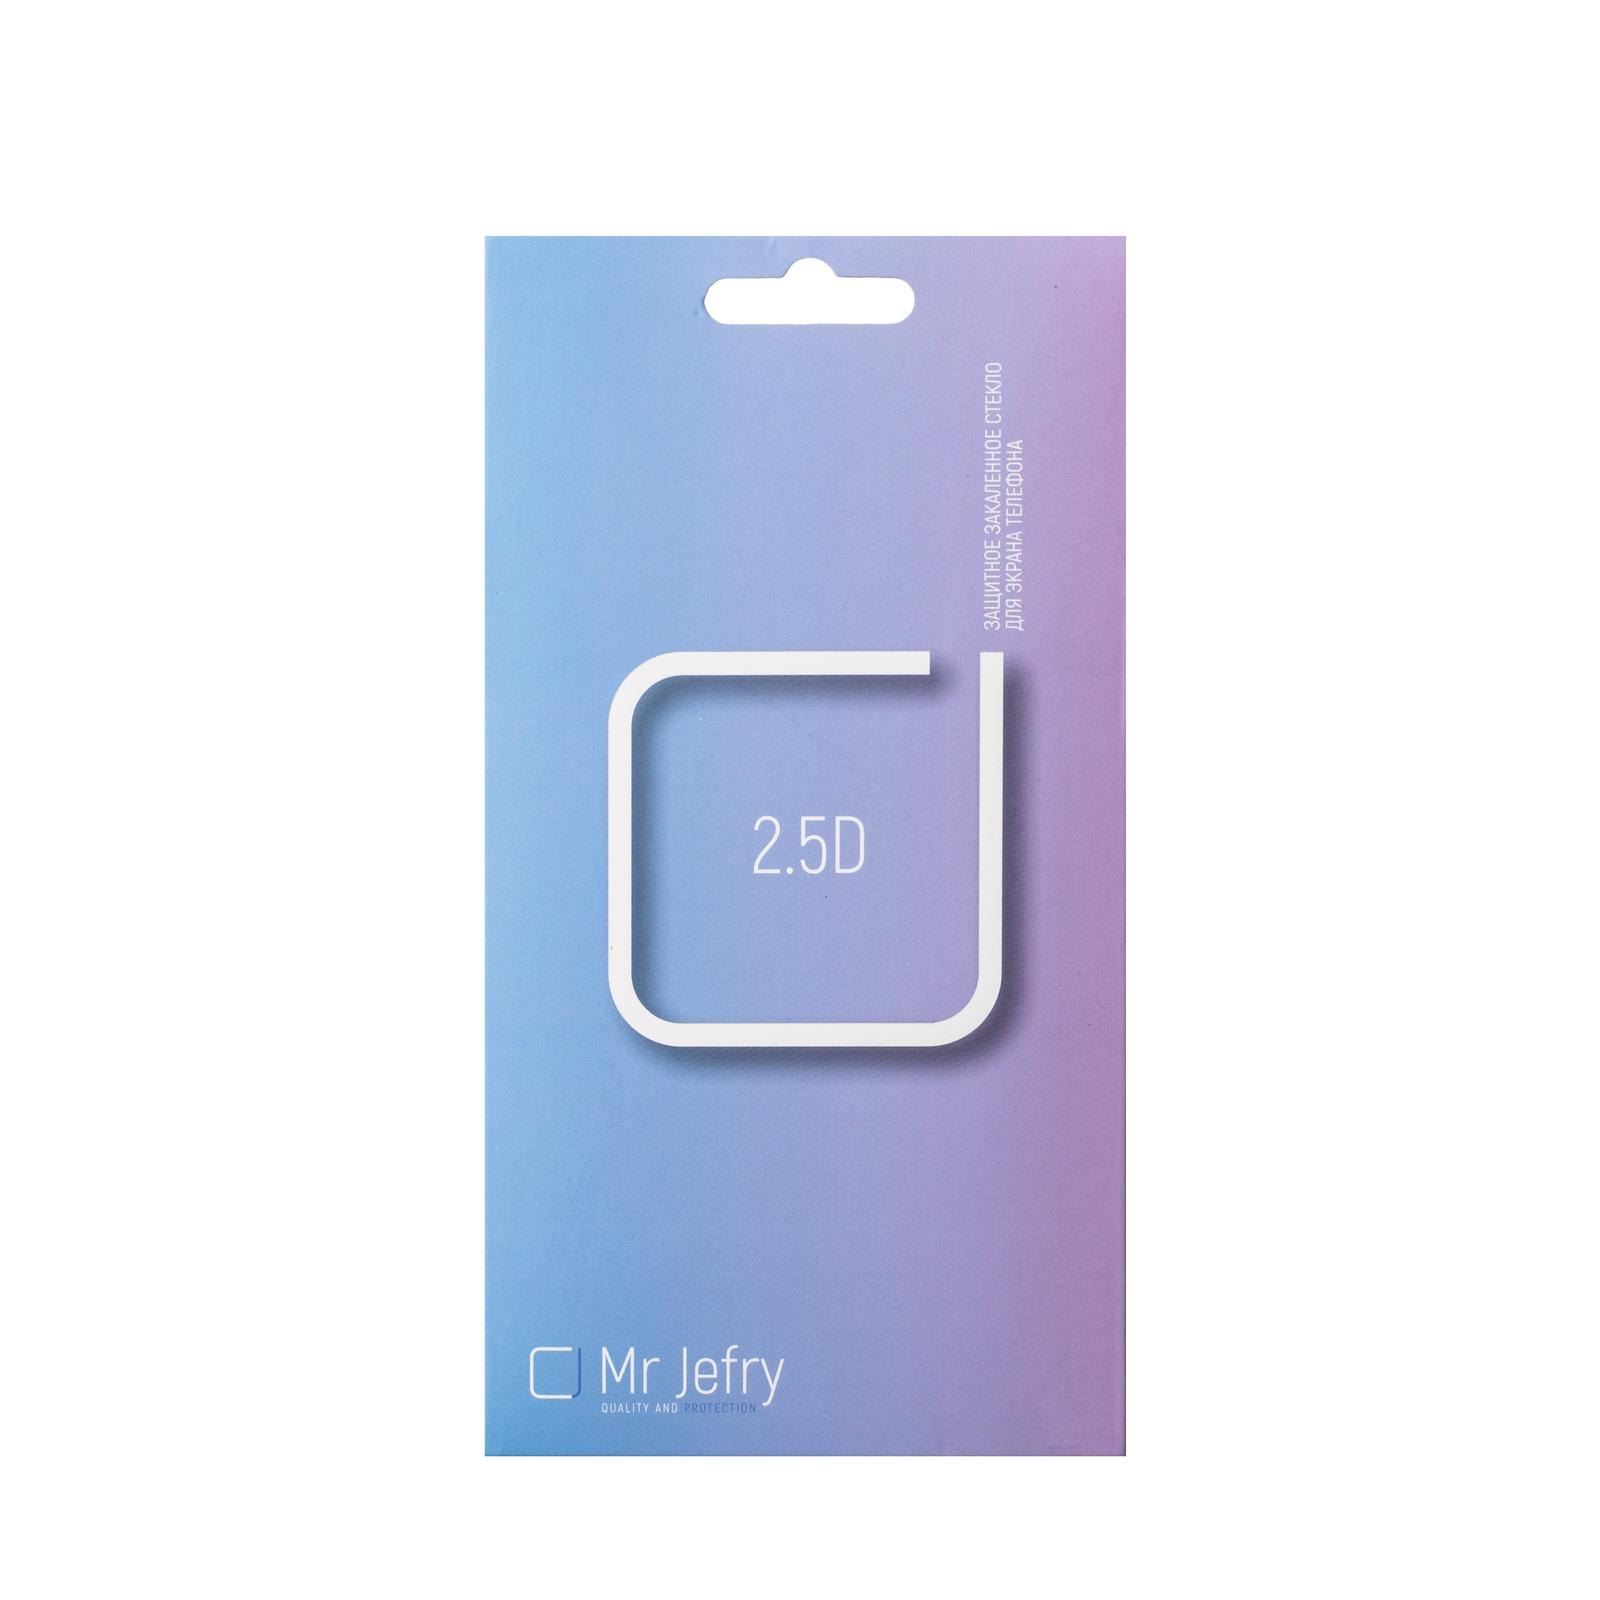 Mr Jefry стекло защитное (многослойное) 2,5D для Huawei Honor A6